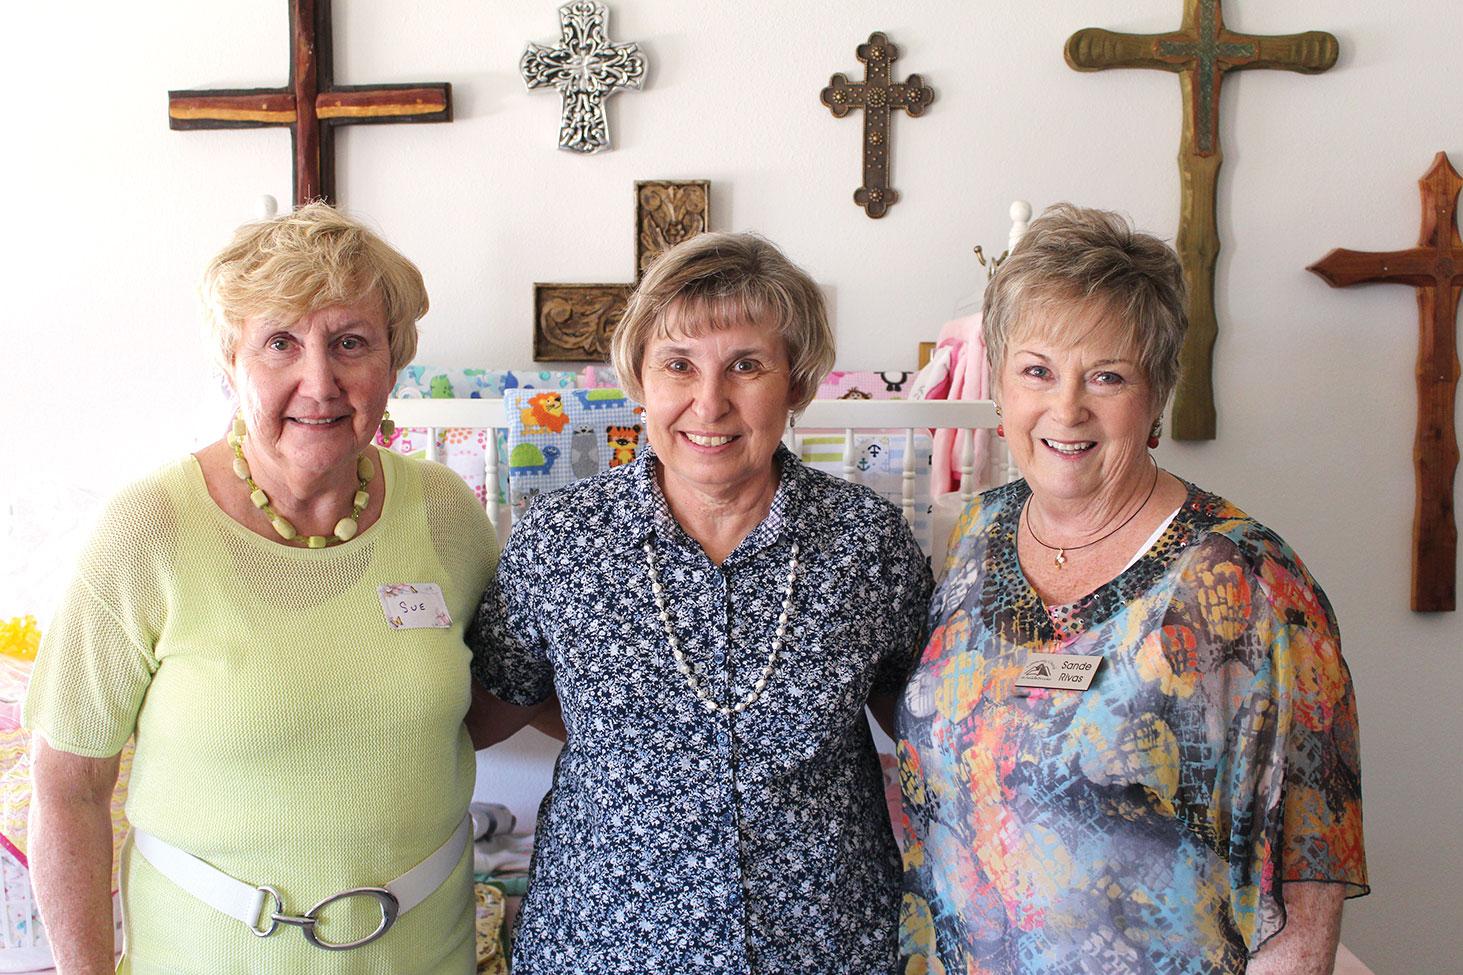 Left to right: Sue Birky, Clare Grochocki and Sande Rivas